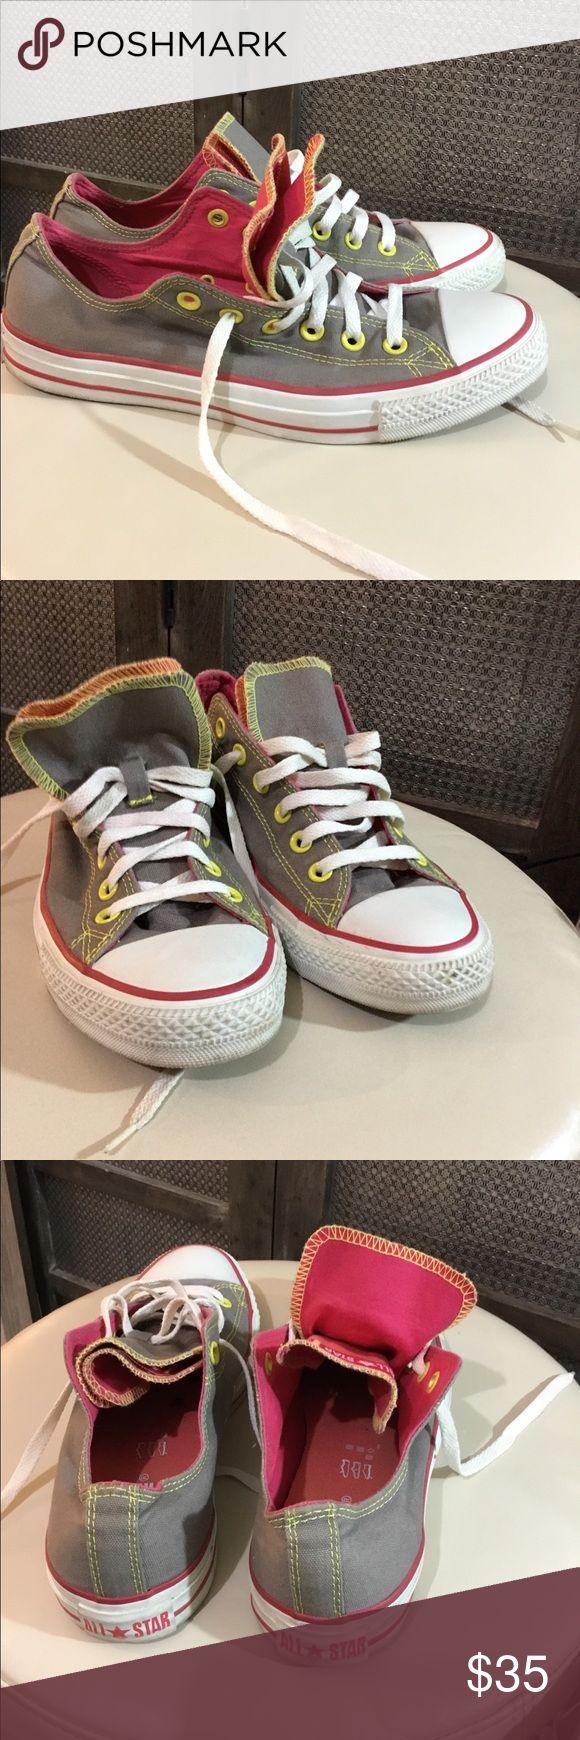 Converse double tongue low top shoe in gray & pink Converse double tongue low top shoe in gray & pink Women's 10, Men's 8 Converse Shoes Sneakers